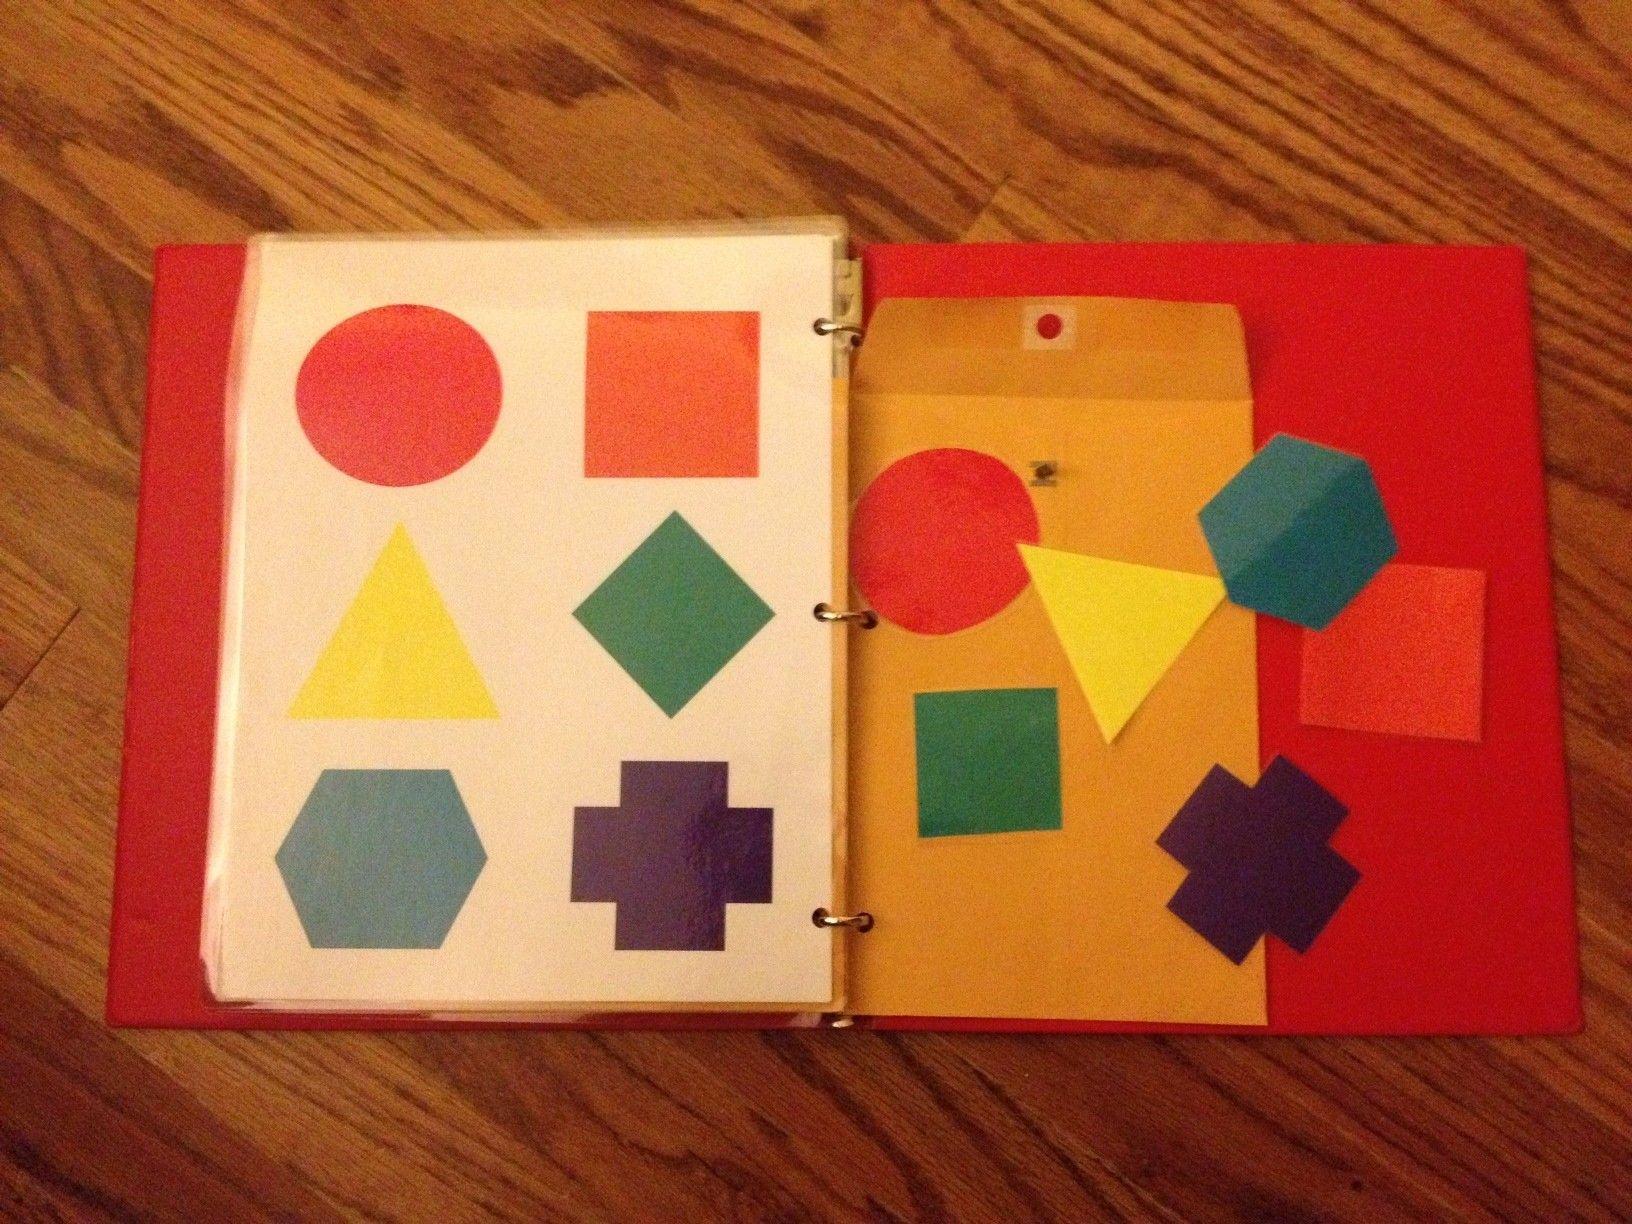 DIY folder activities... MicroSoft Word, creativity, binder, laminator (cheap one, Pinned separately!), velcro, envelopes, time... hours of fun?